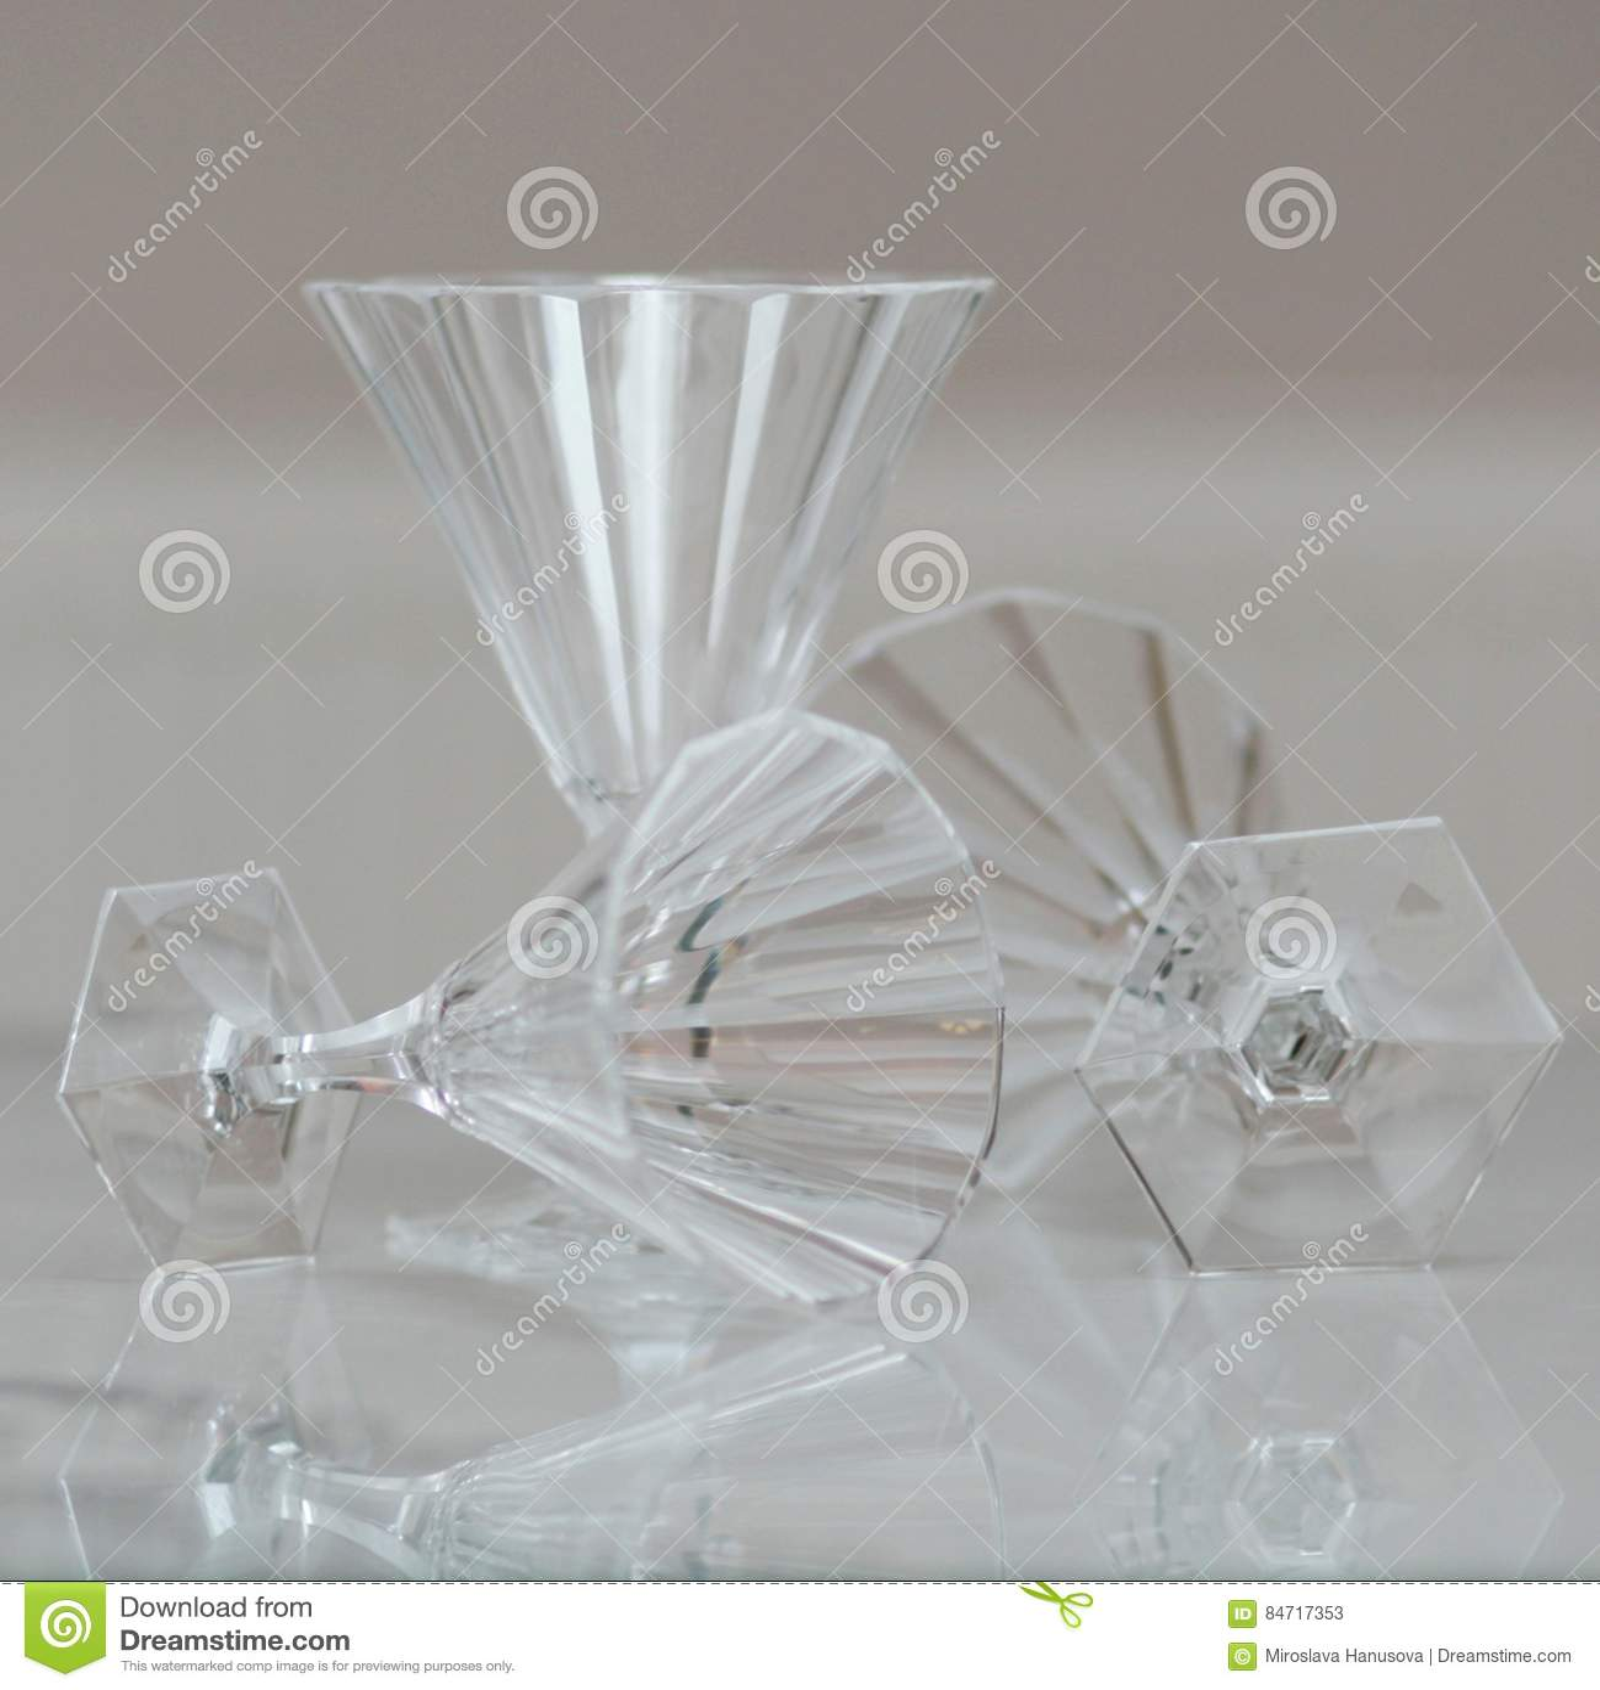 Antique Glass Set Still Life 5  Stock Image - Image of deco